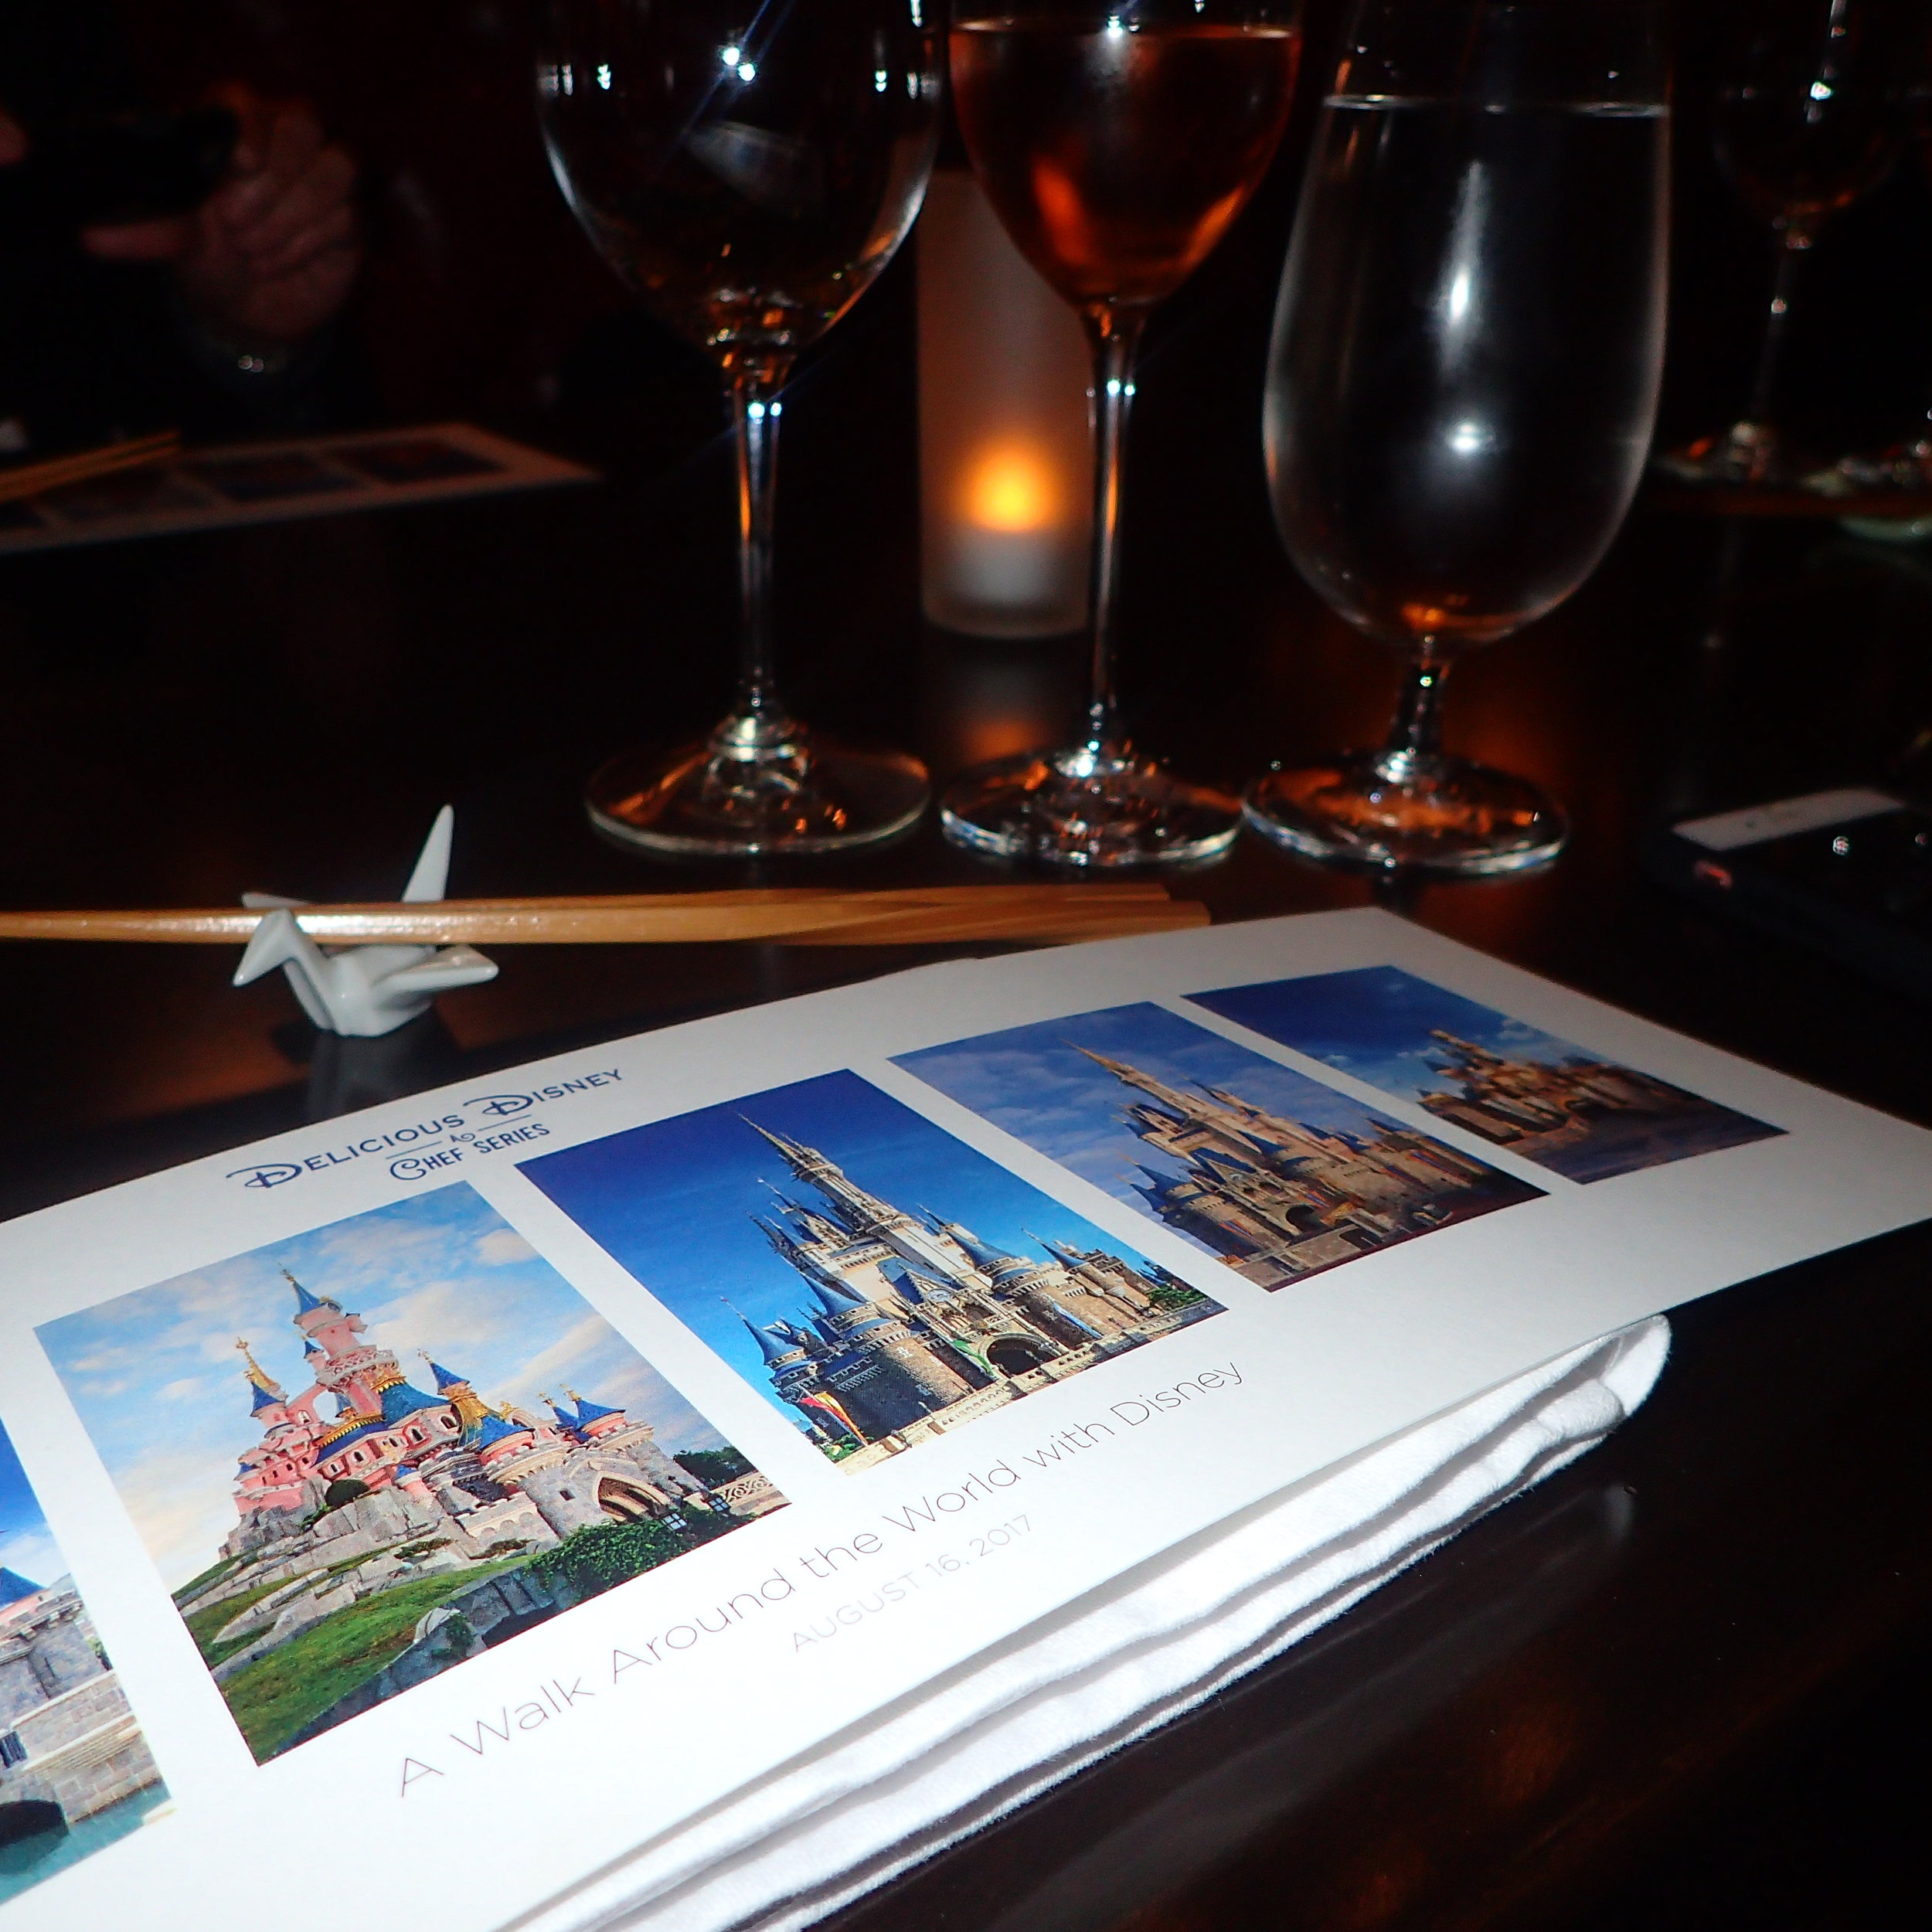 The menu with castles l-r of Shanghai, Hong Kong, Paris, Tokyo, Disney World and California